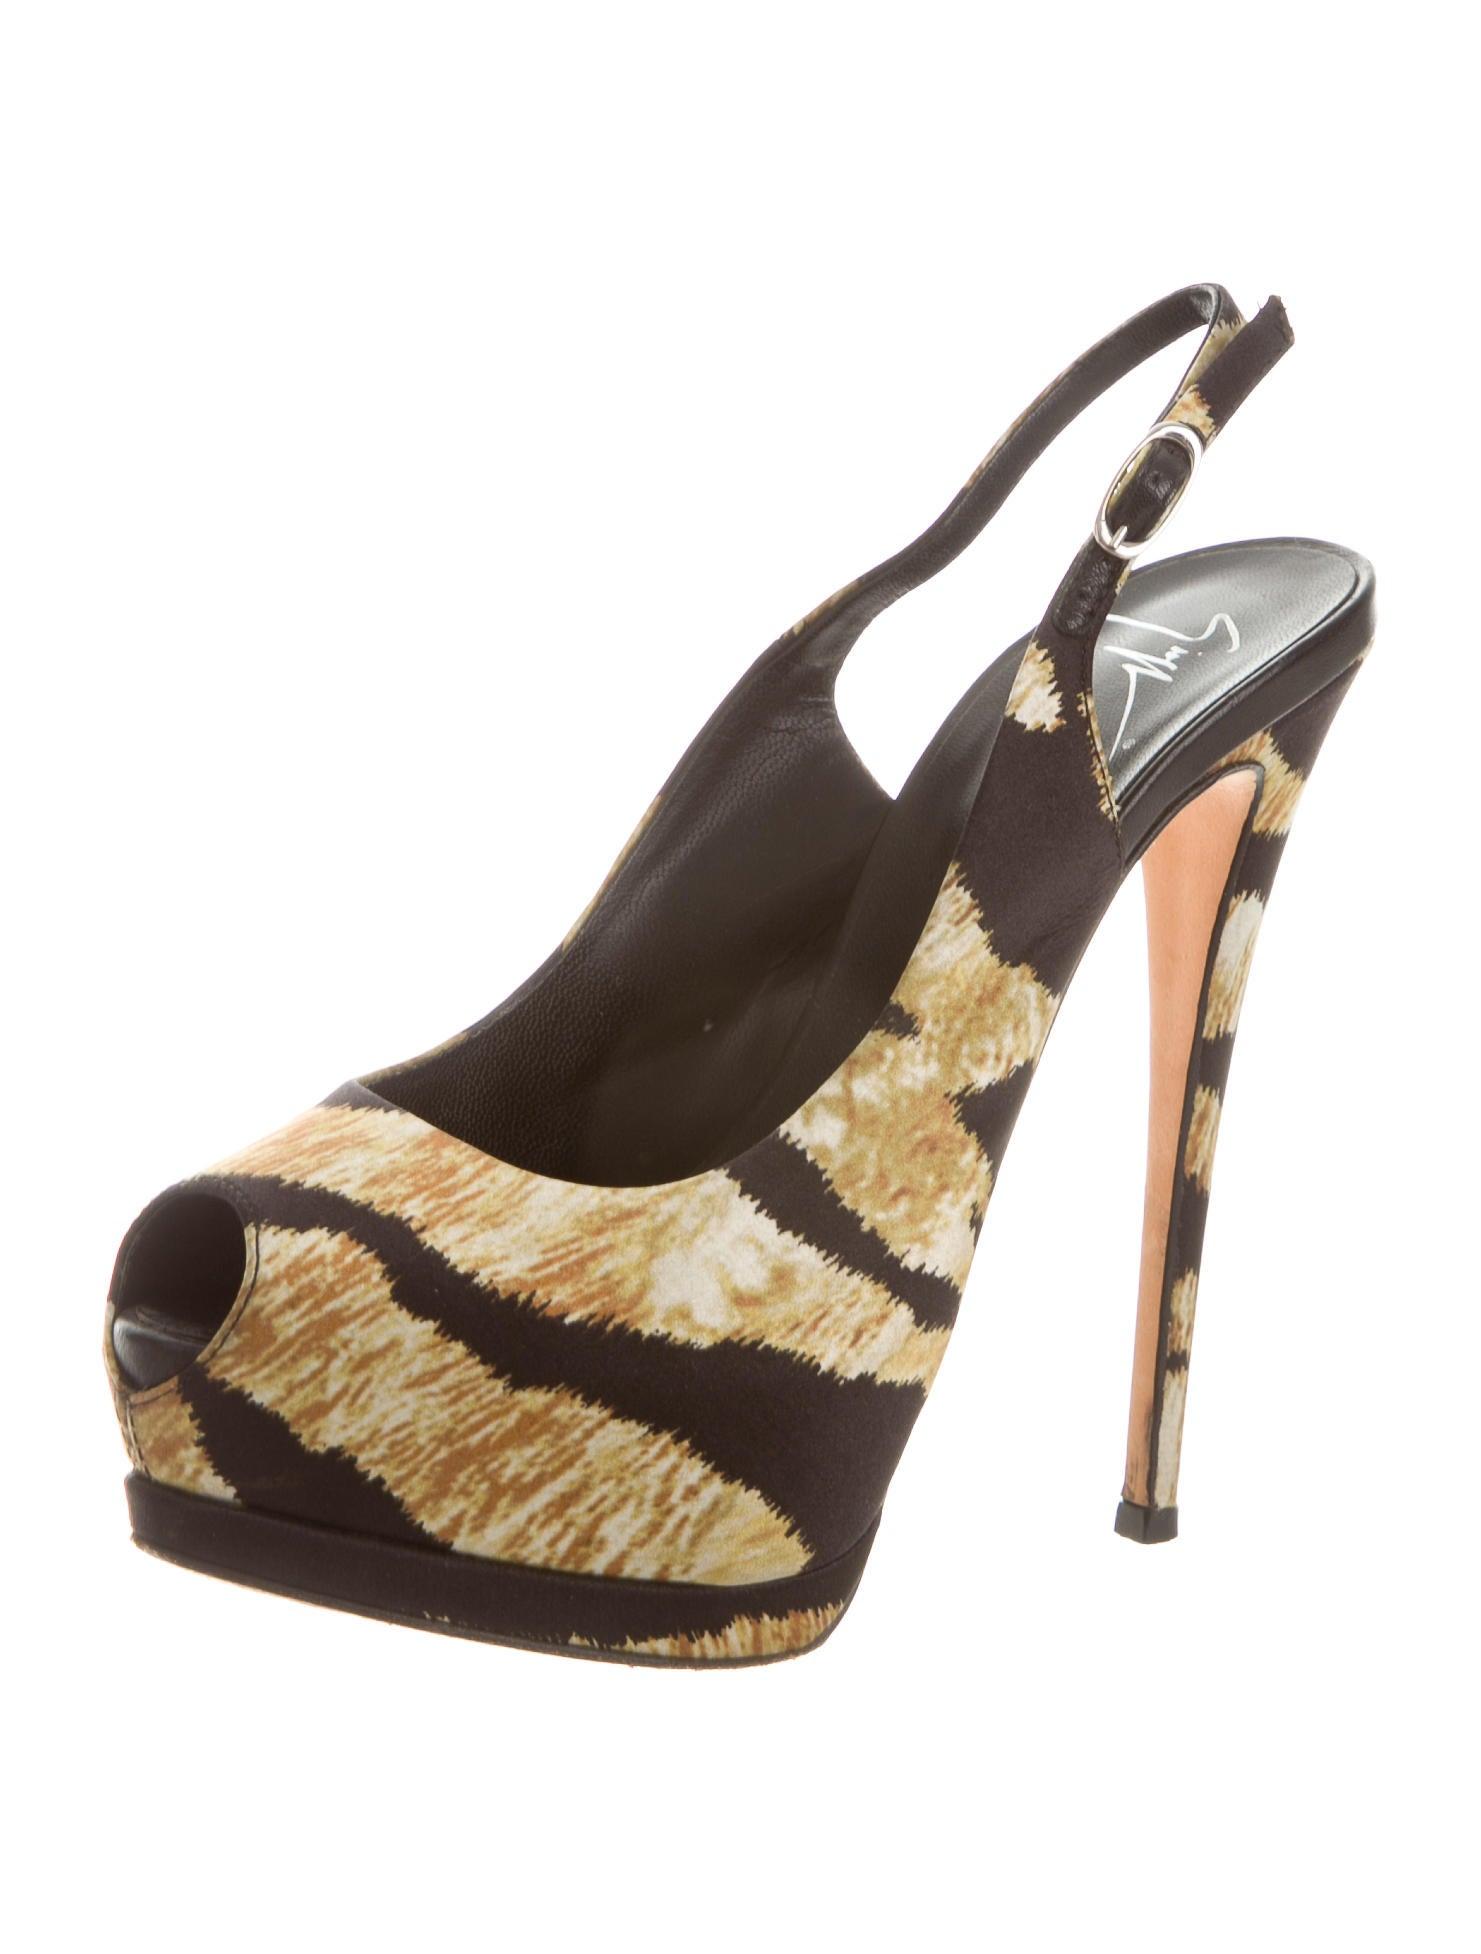 giuseppe zanotti peep toe platform sandals shoes